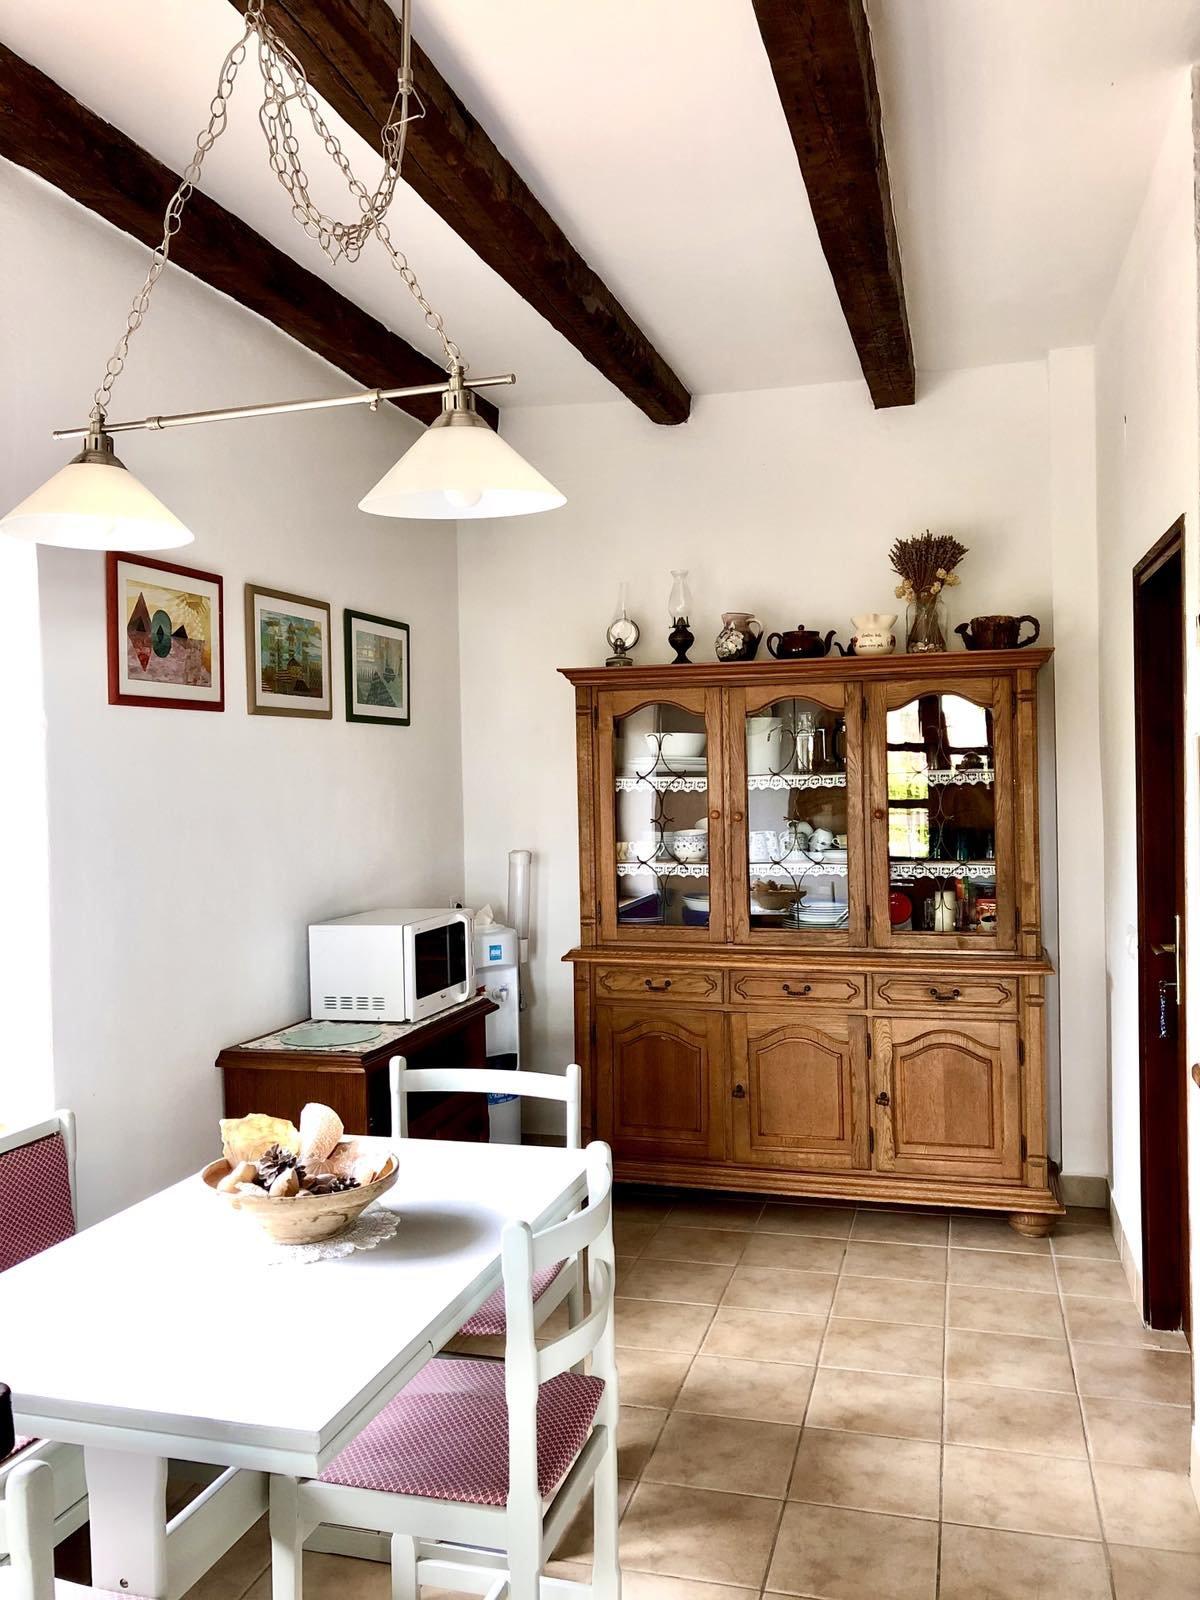 Wohnung MariLavanda, Kueche